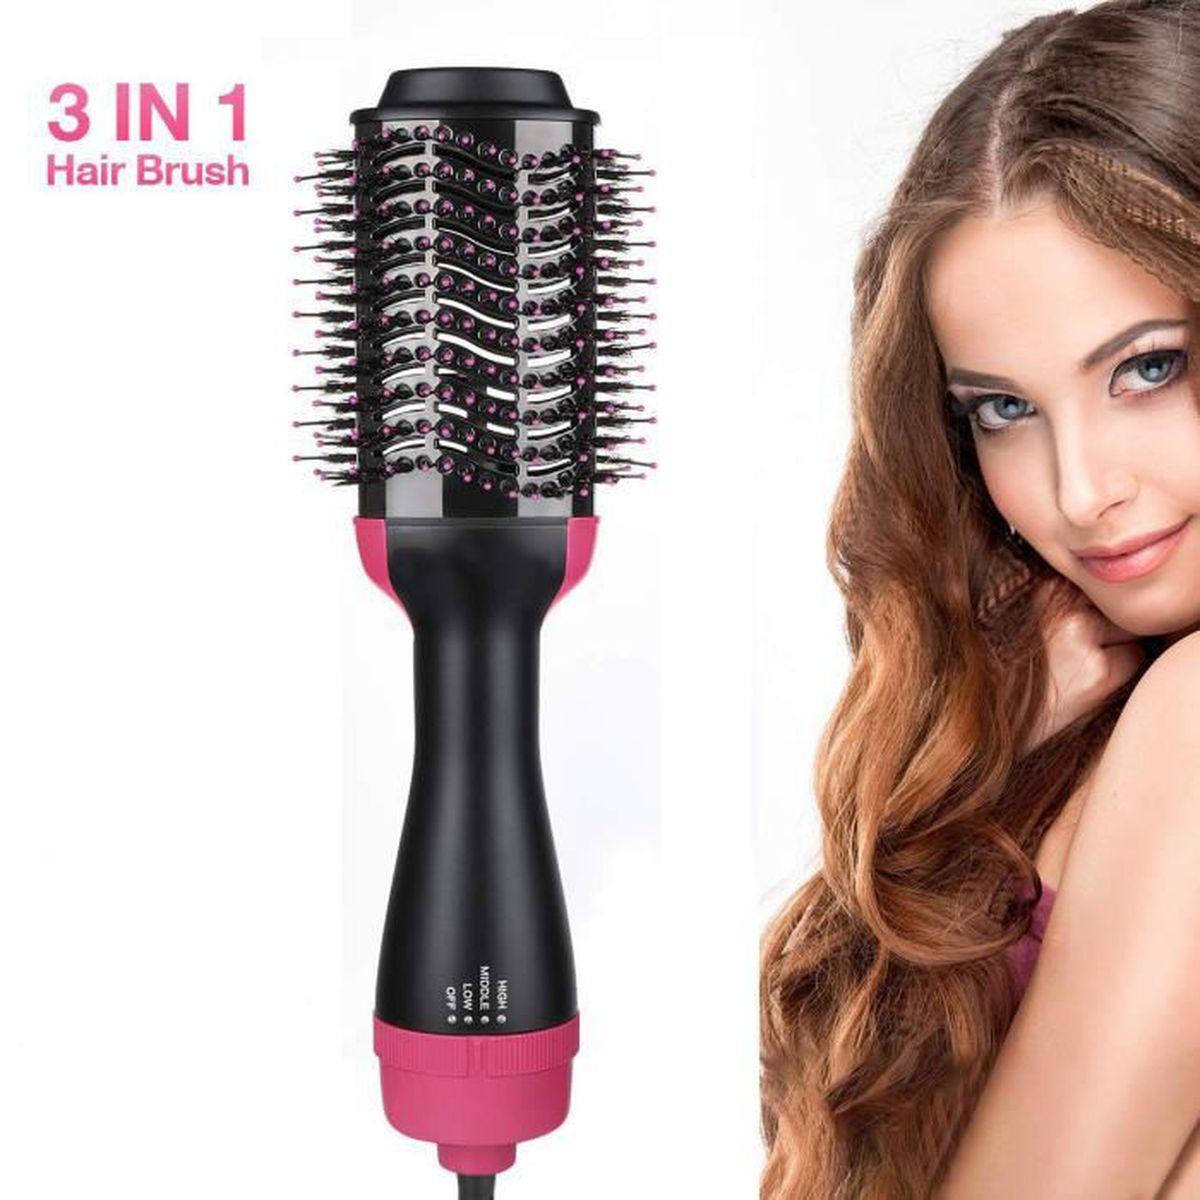 BROSSE SOUFFLANTE Brosse Soufflante Rotative Sèche-Cheveux Styler Br